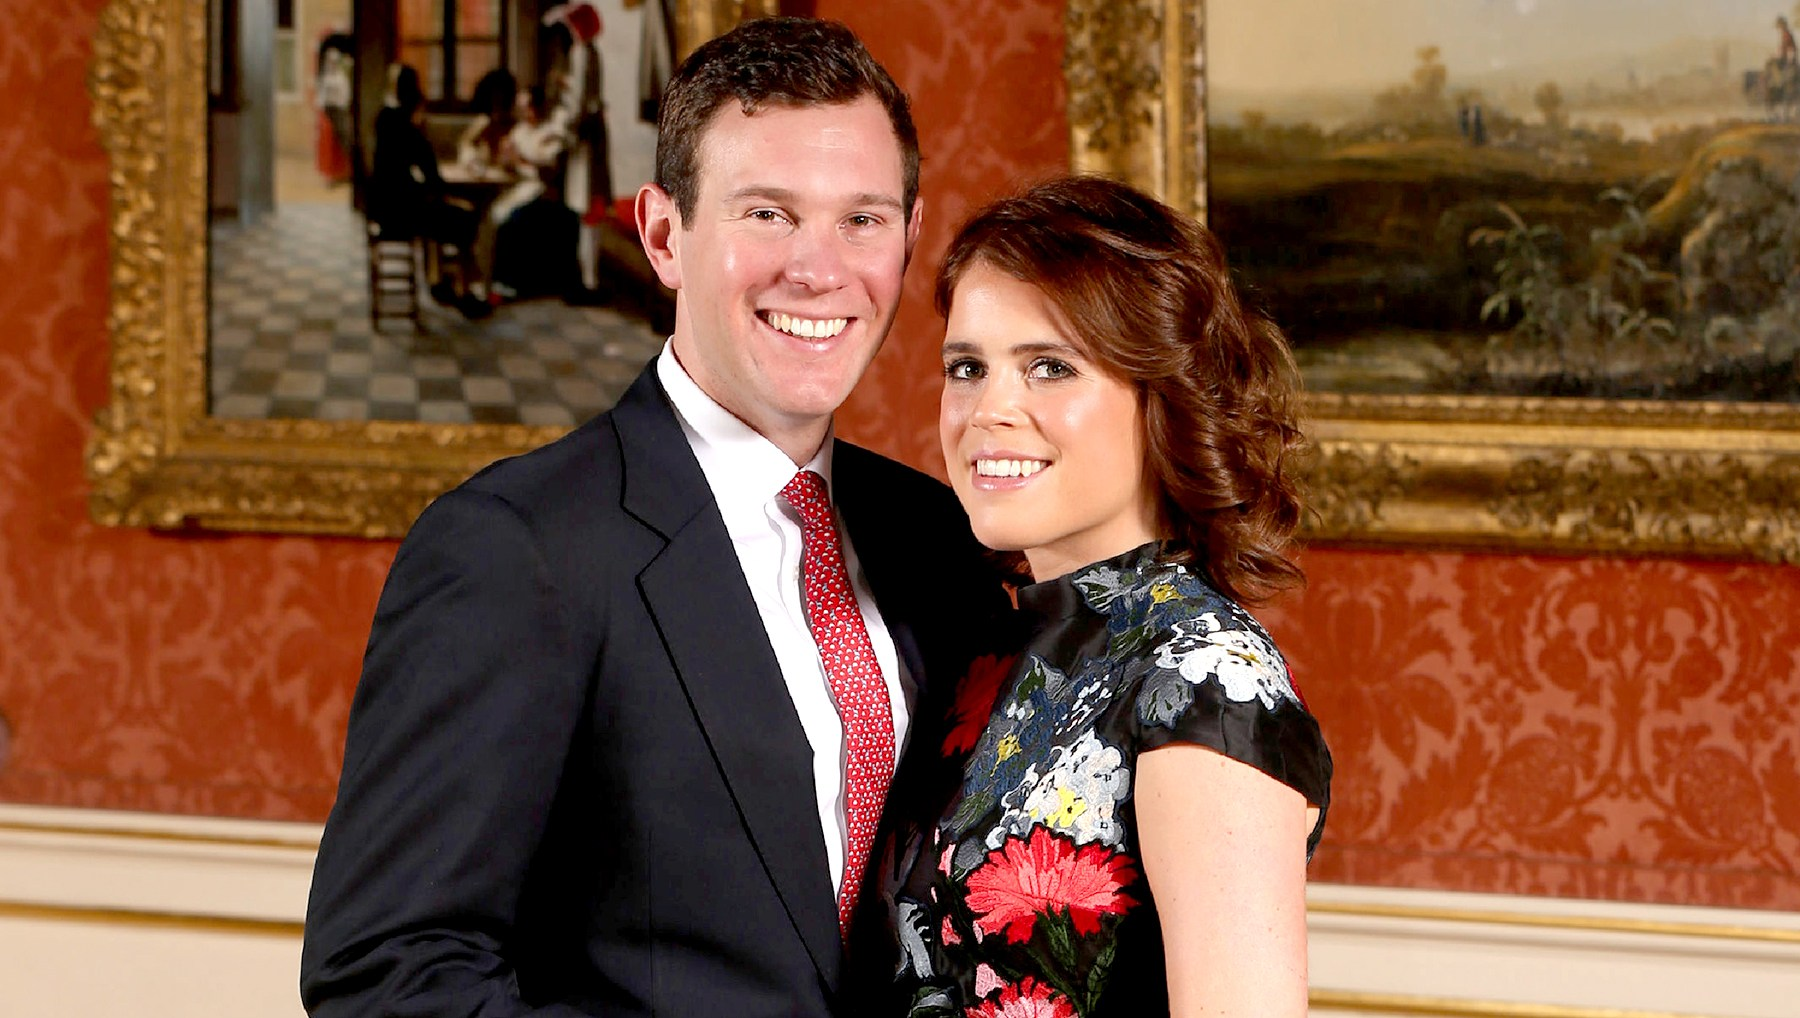 Princess-Eugenie-and-Jack-Brooksbank-wedding-date